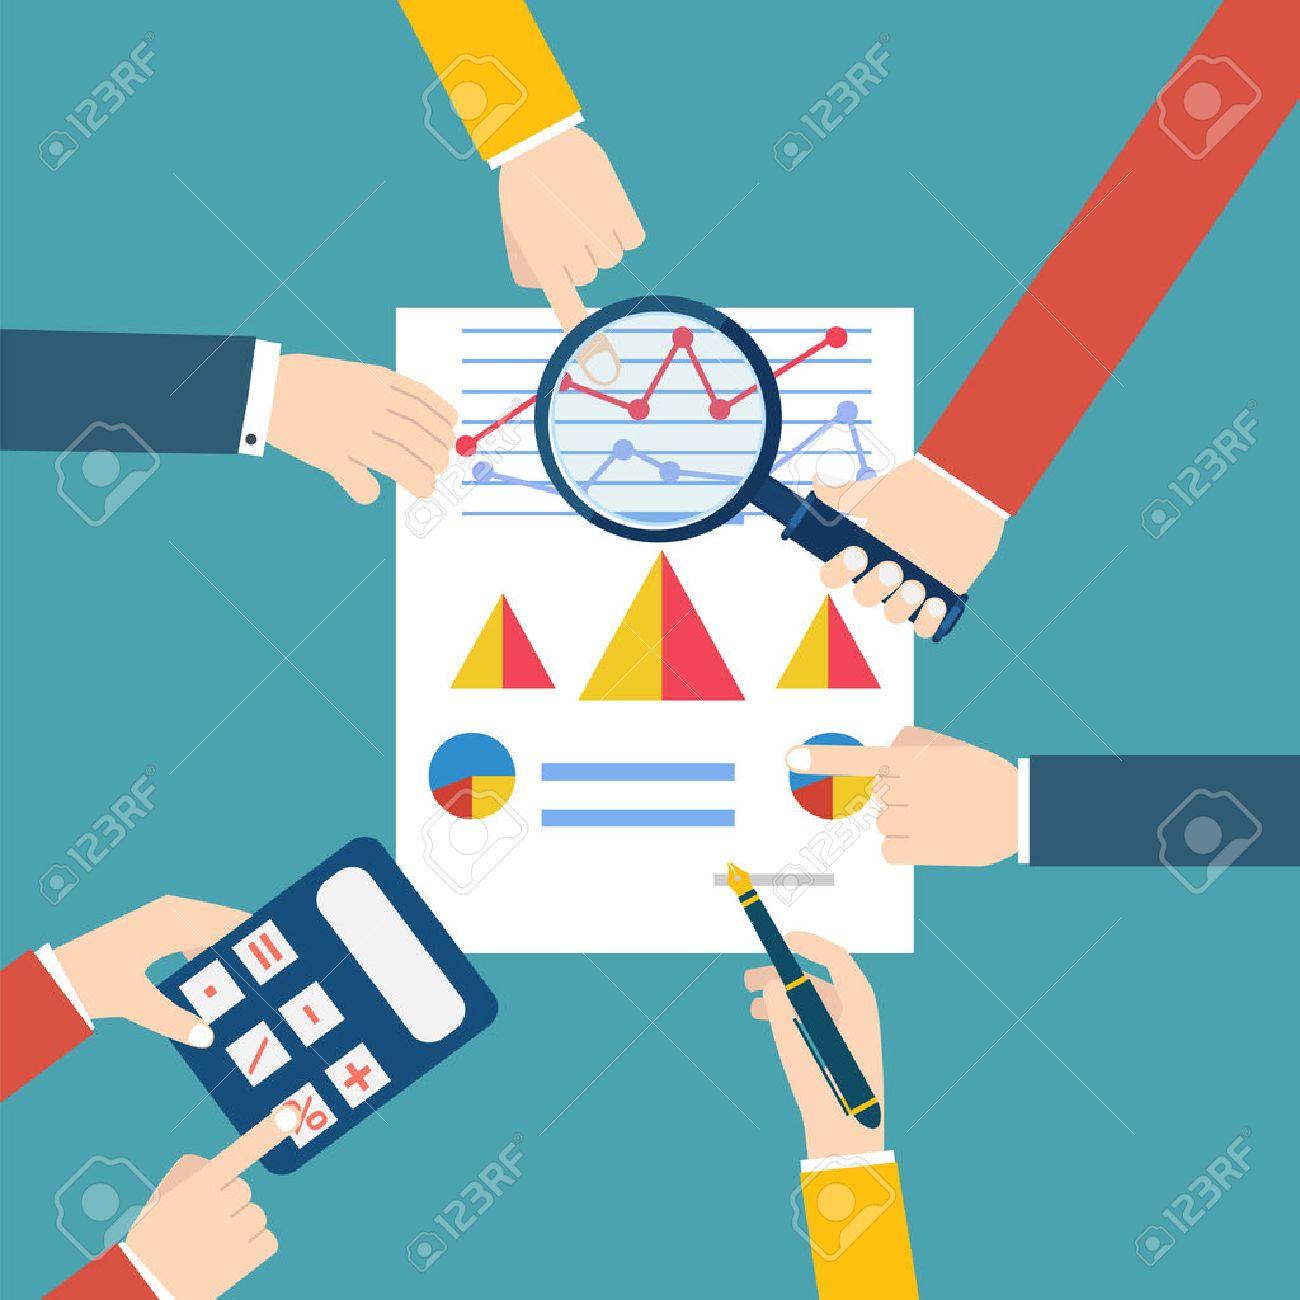 People examining economic statistic. Financial examiner. Vector illustration. - 41672977